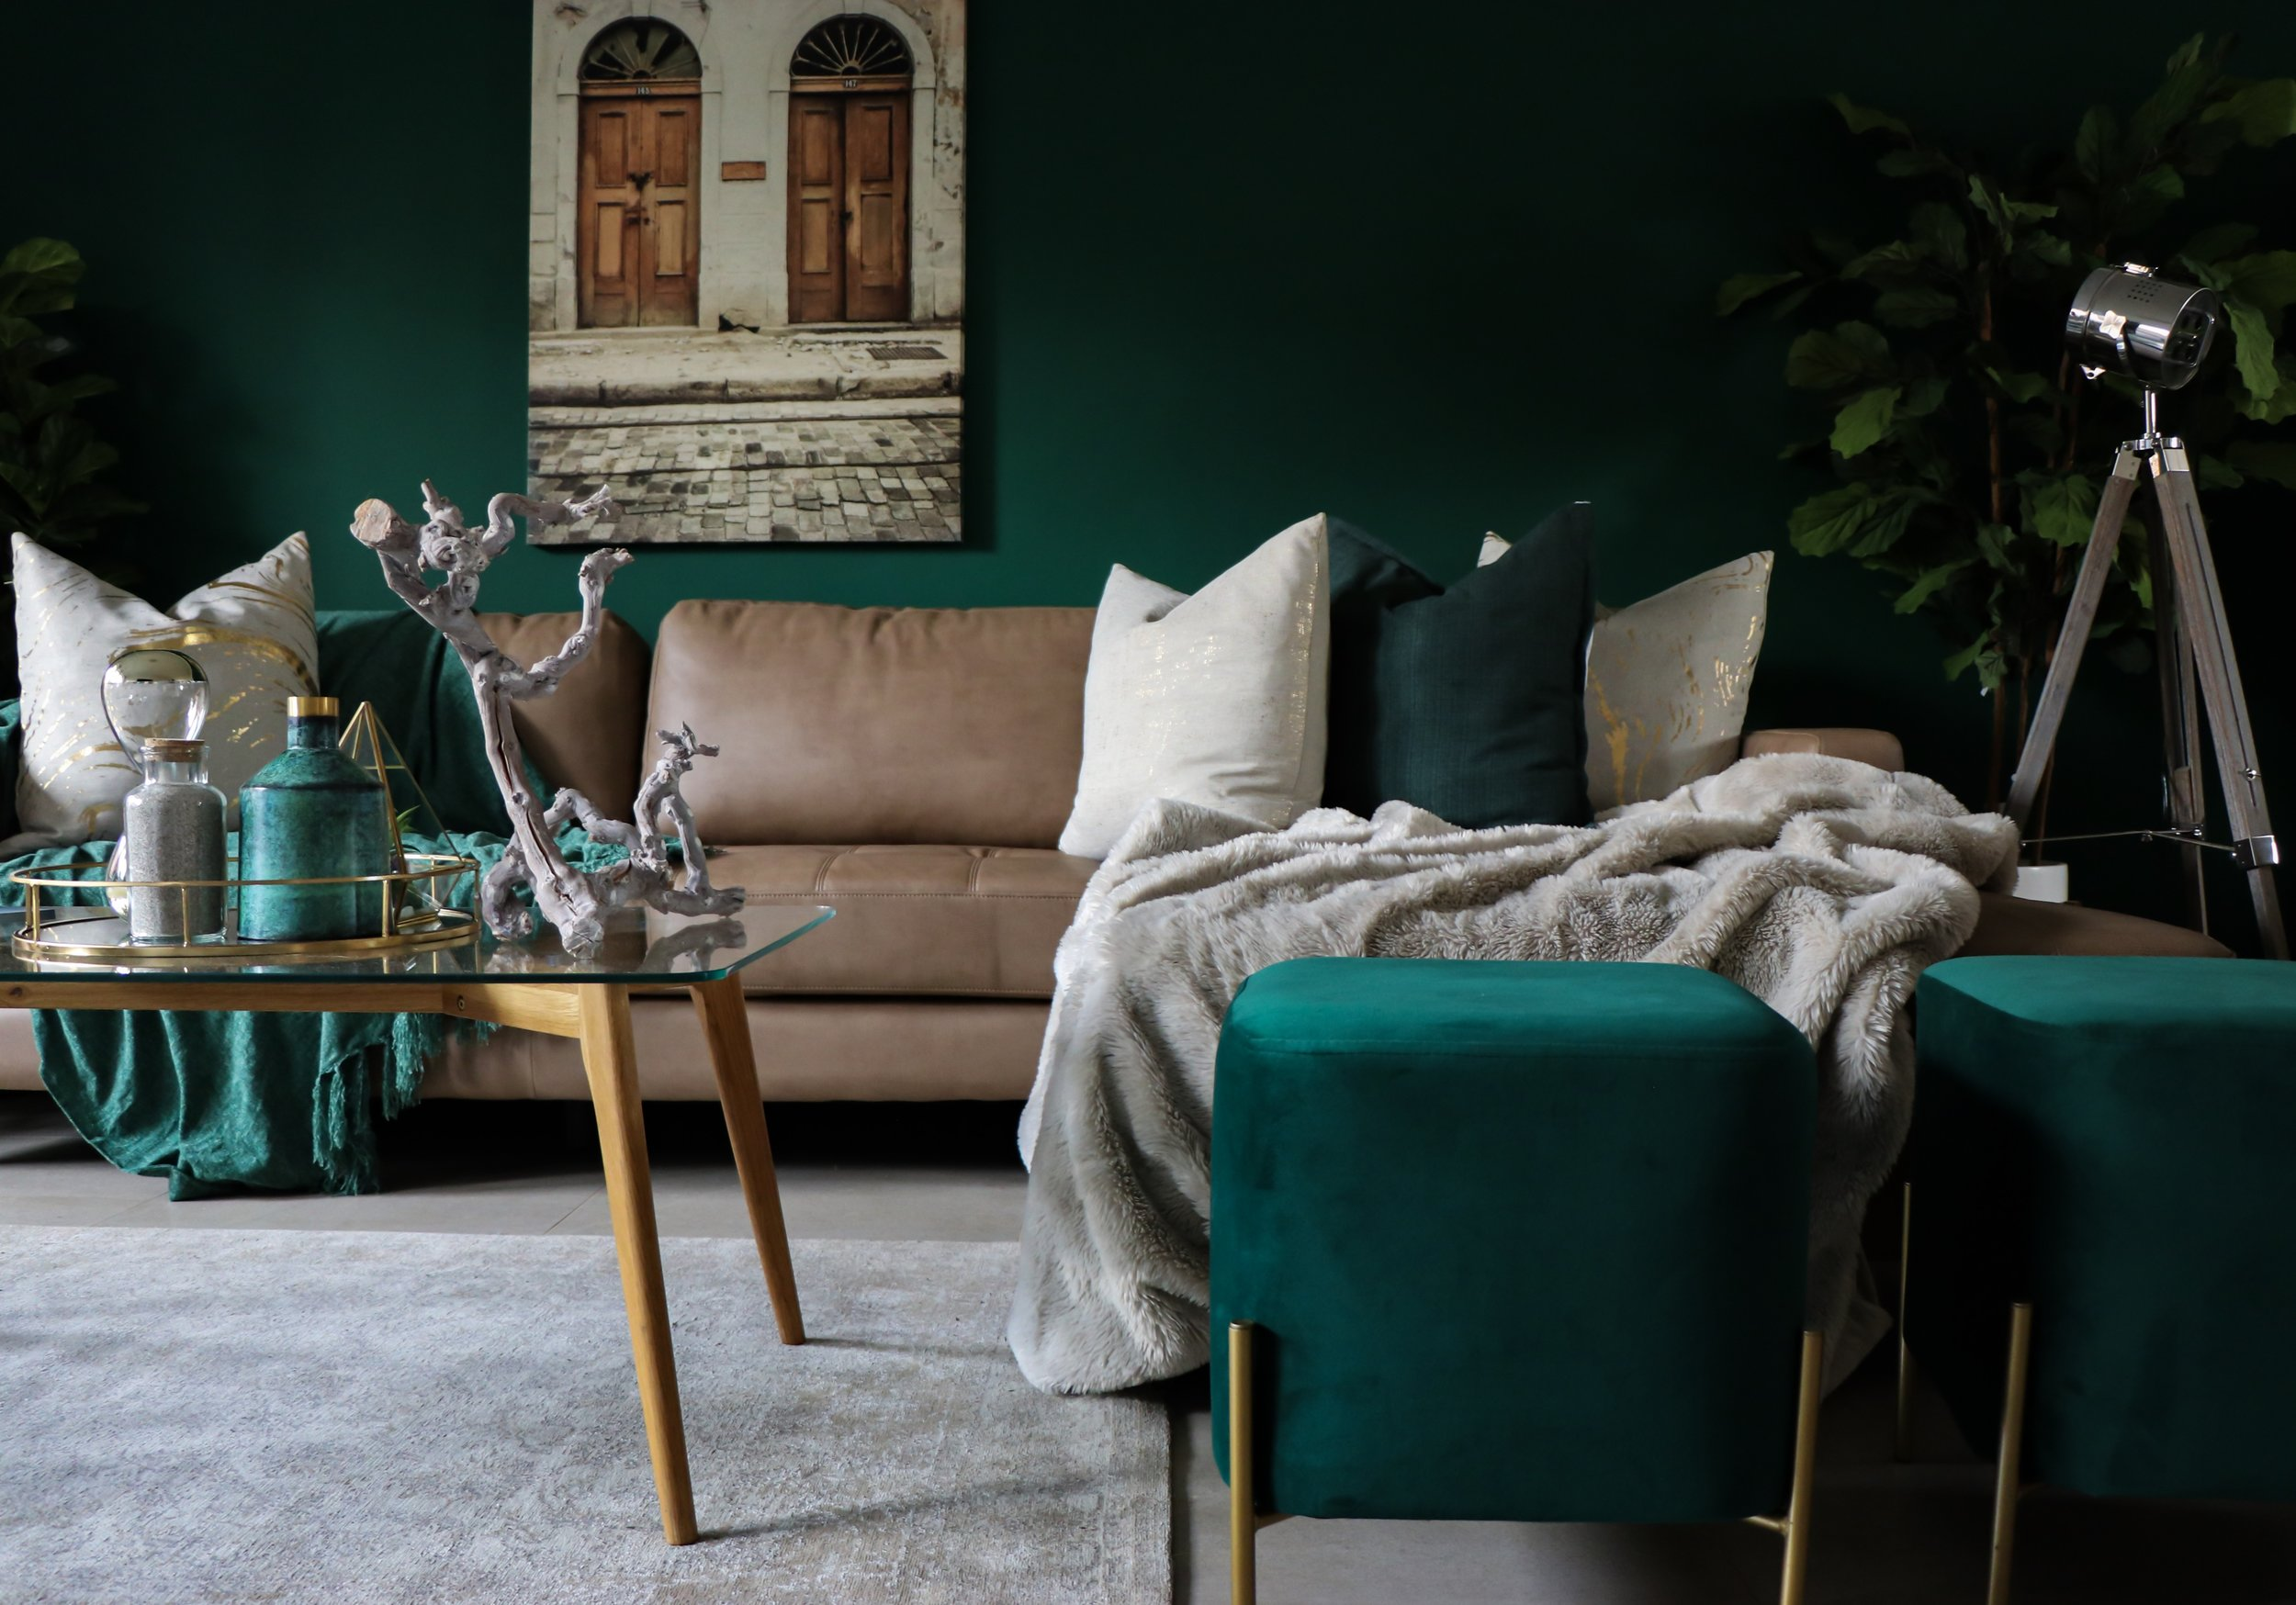 ¡Agrega un poco de color a tu hogar! -